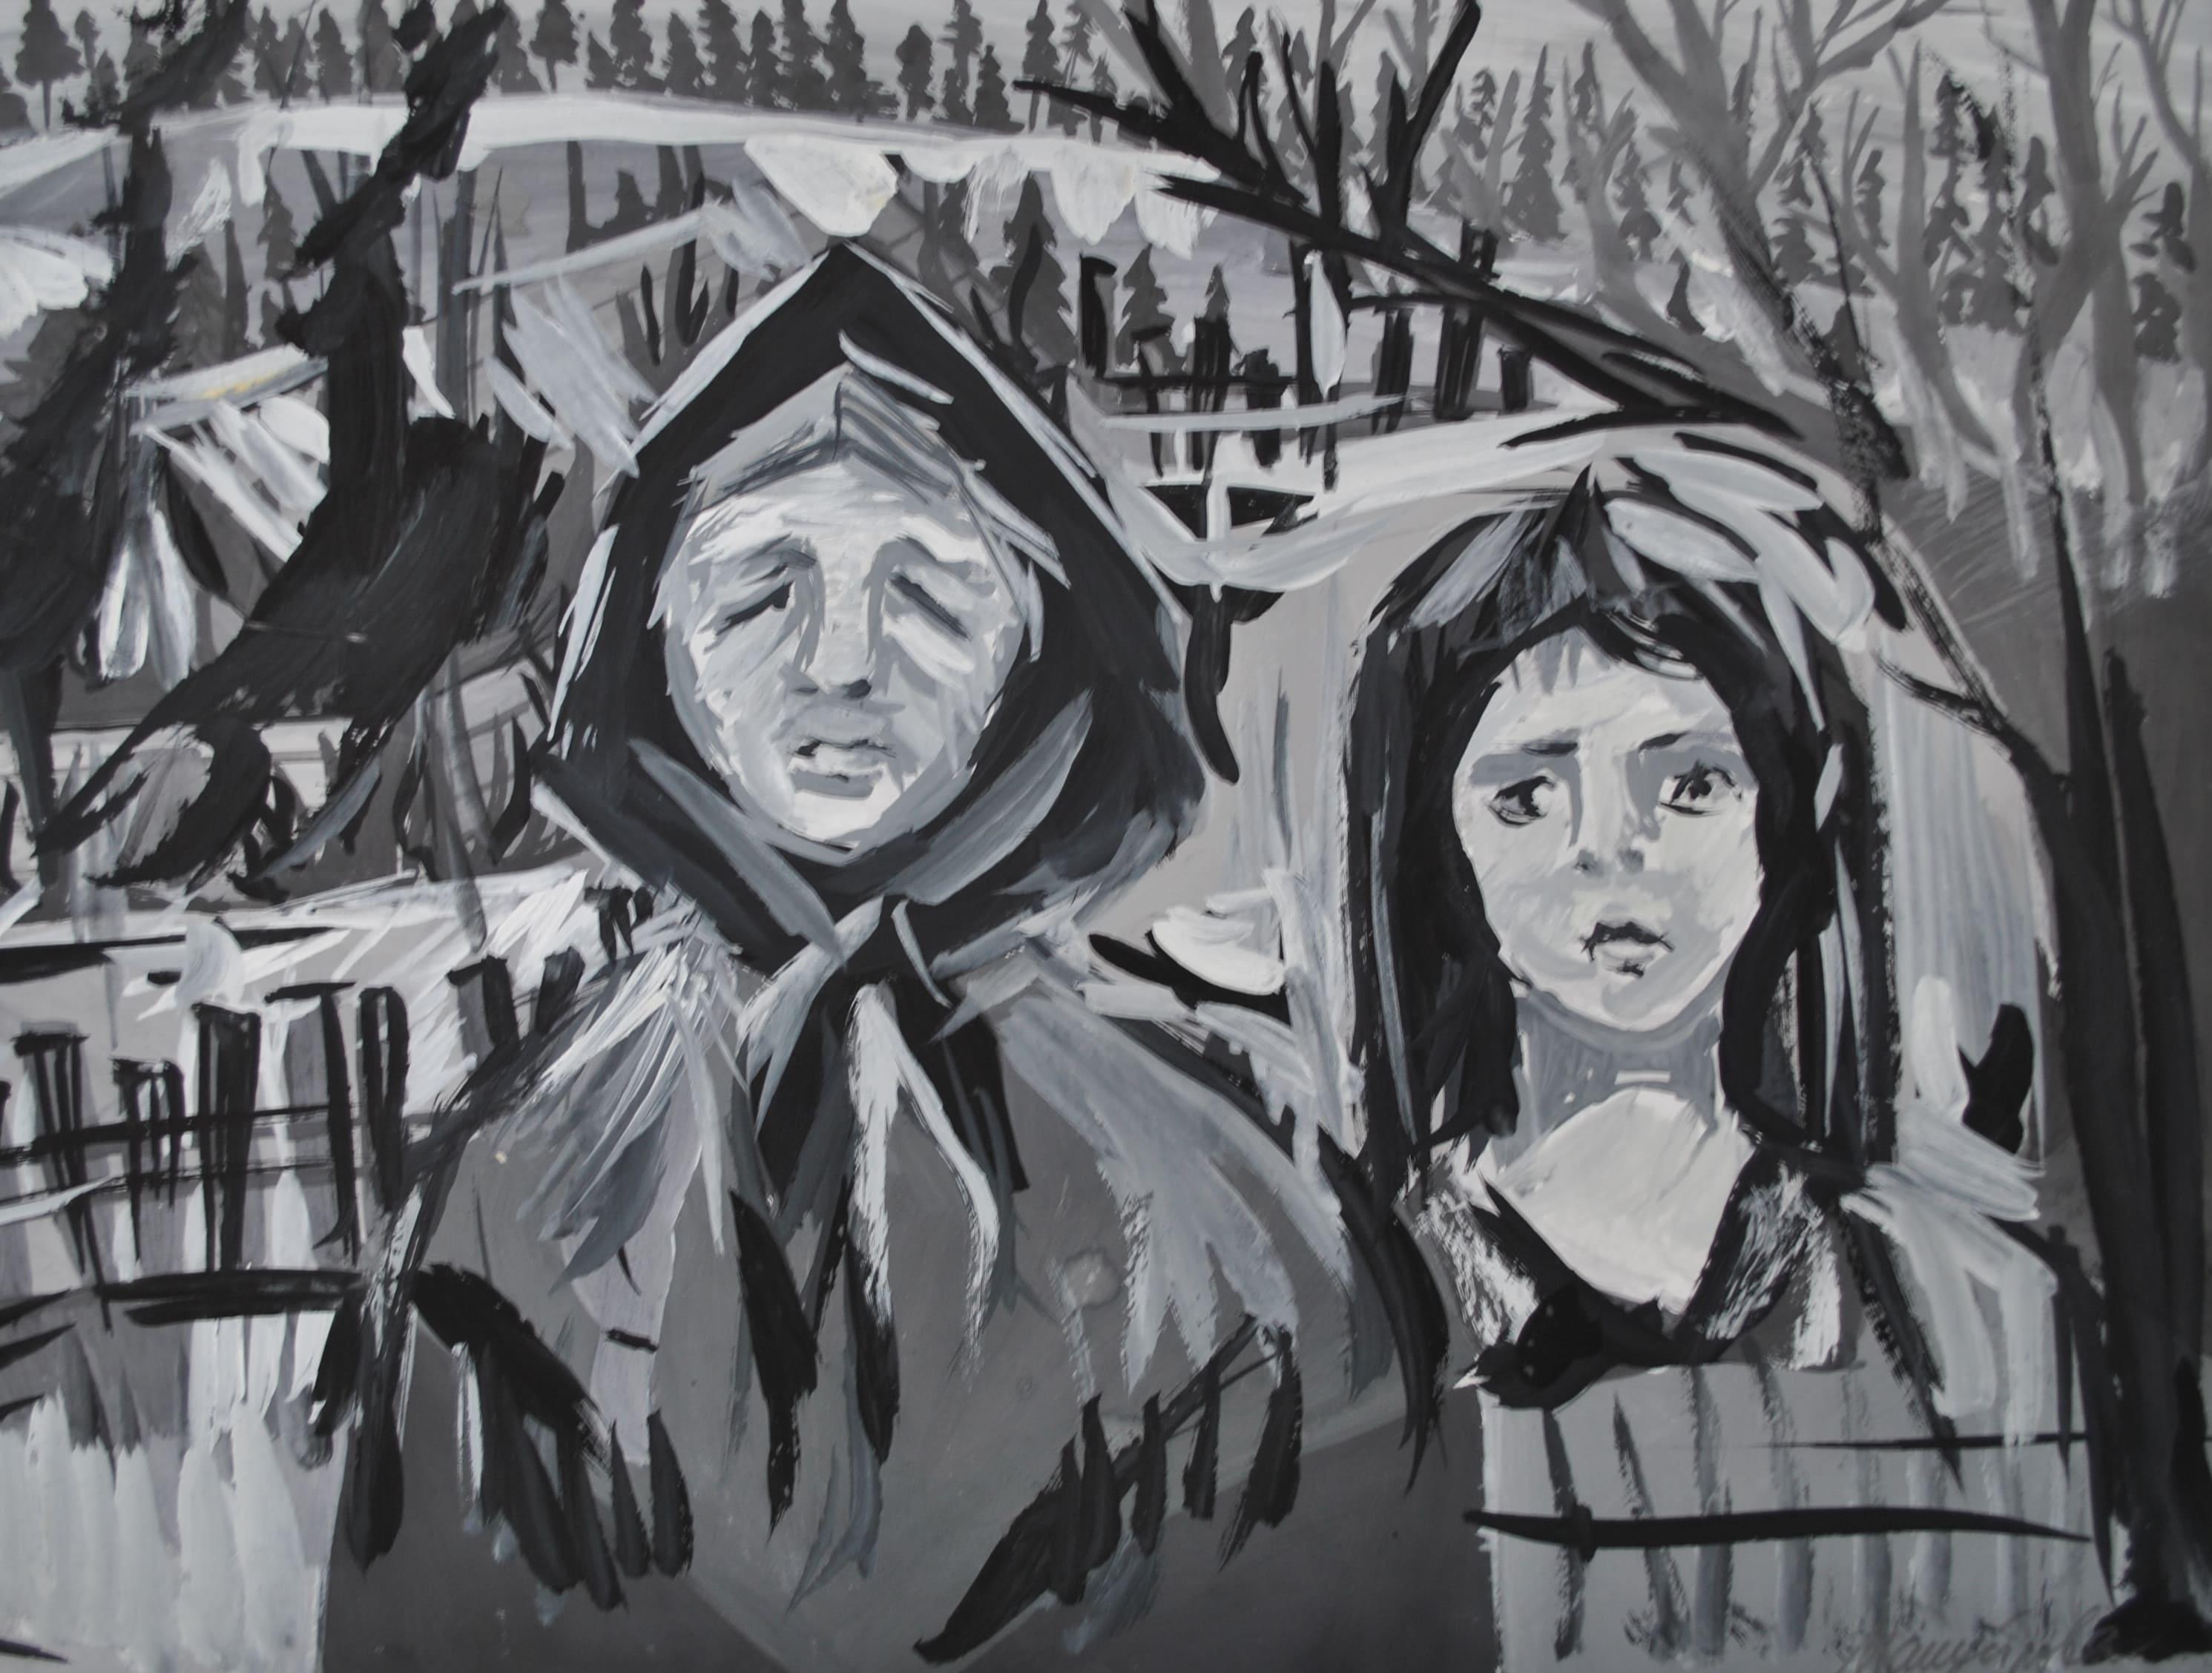 Мануйлова Екатерина 13 лет